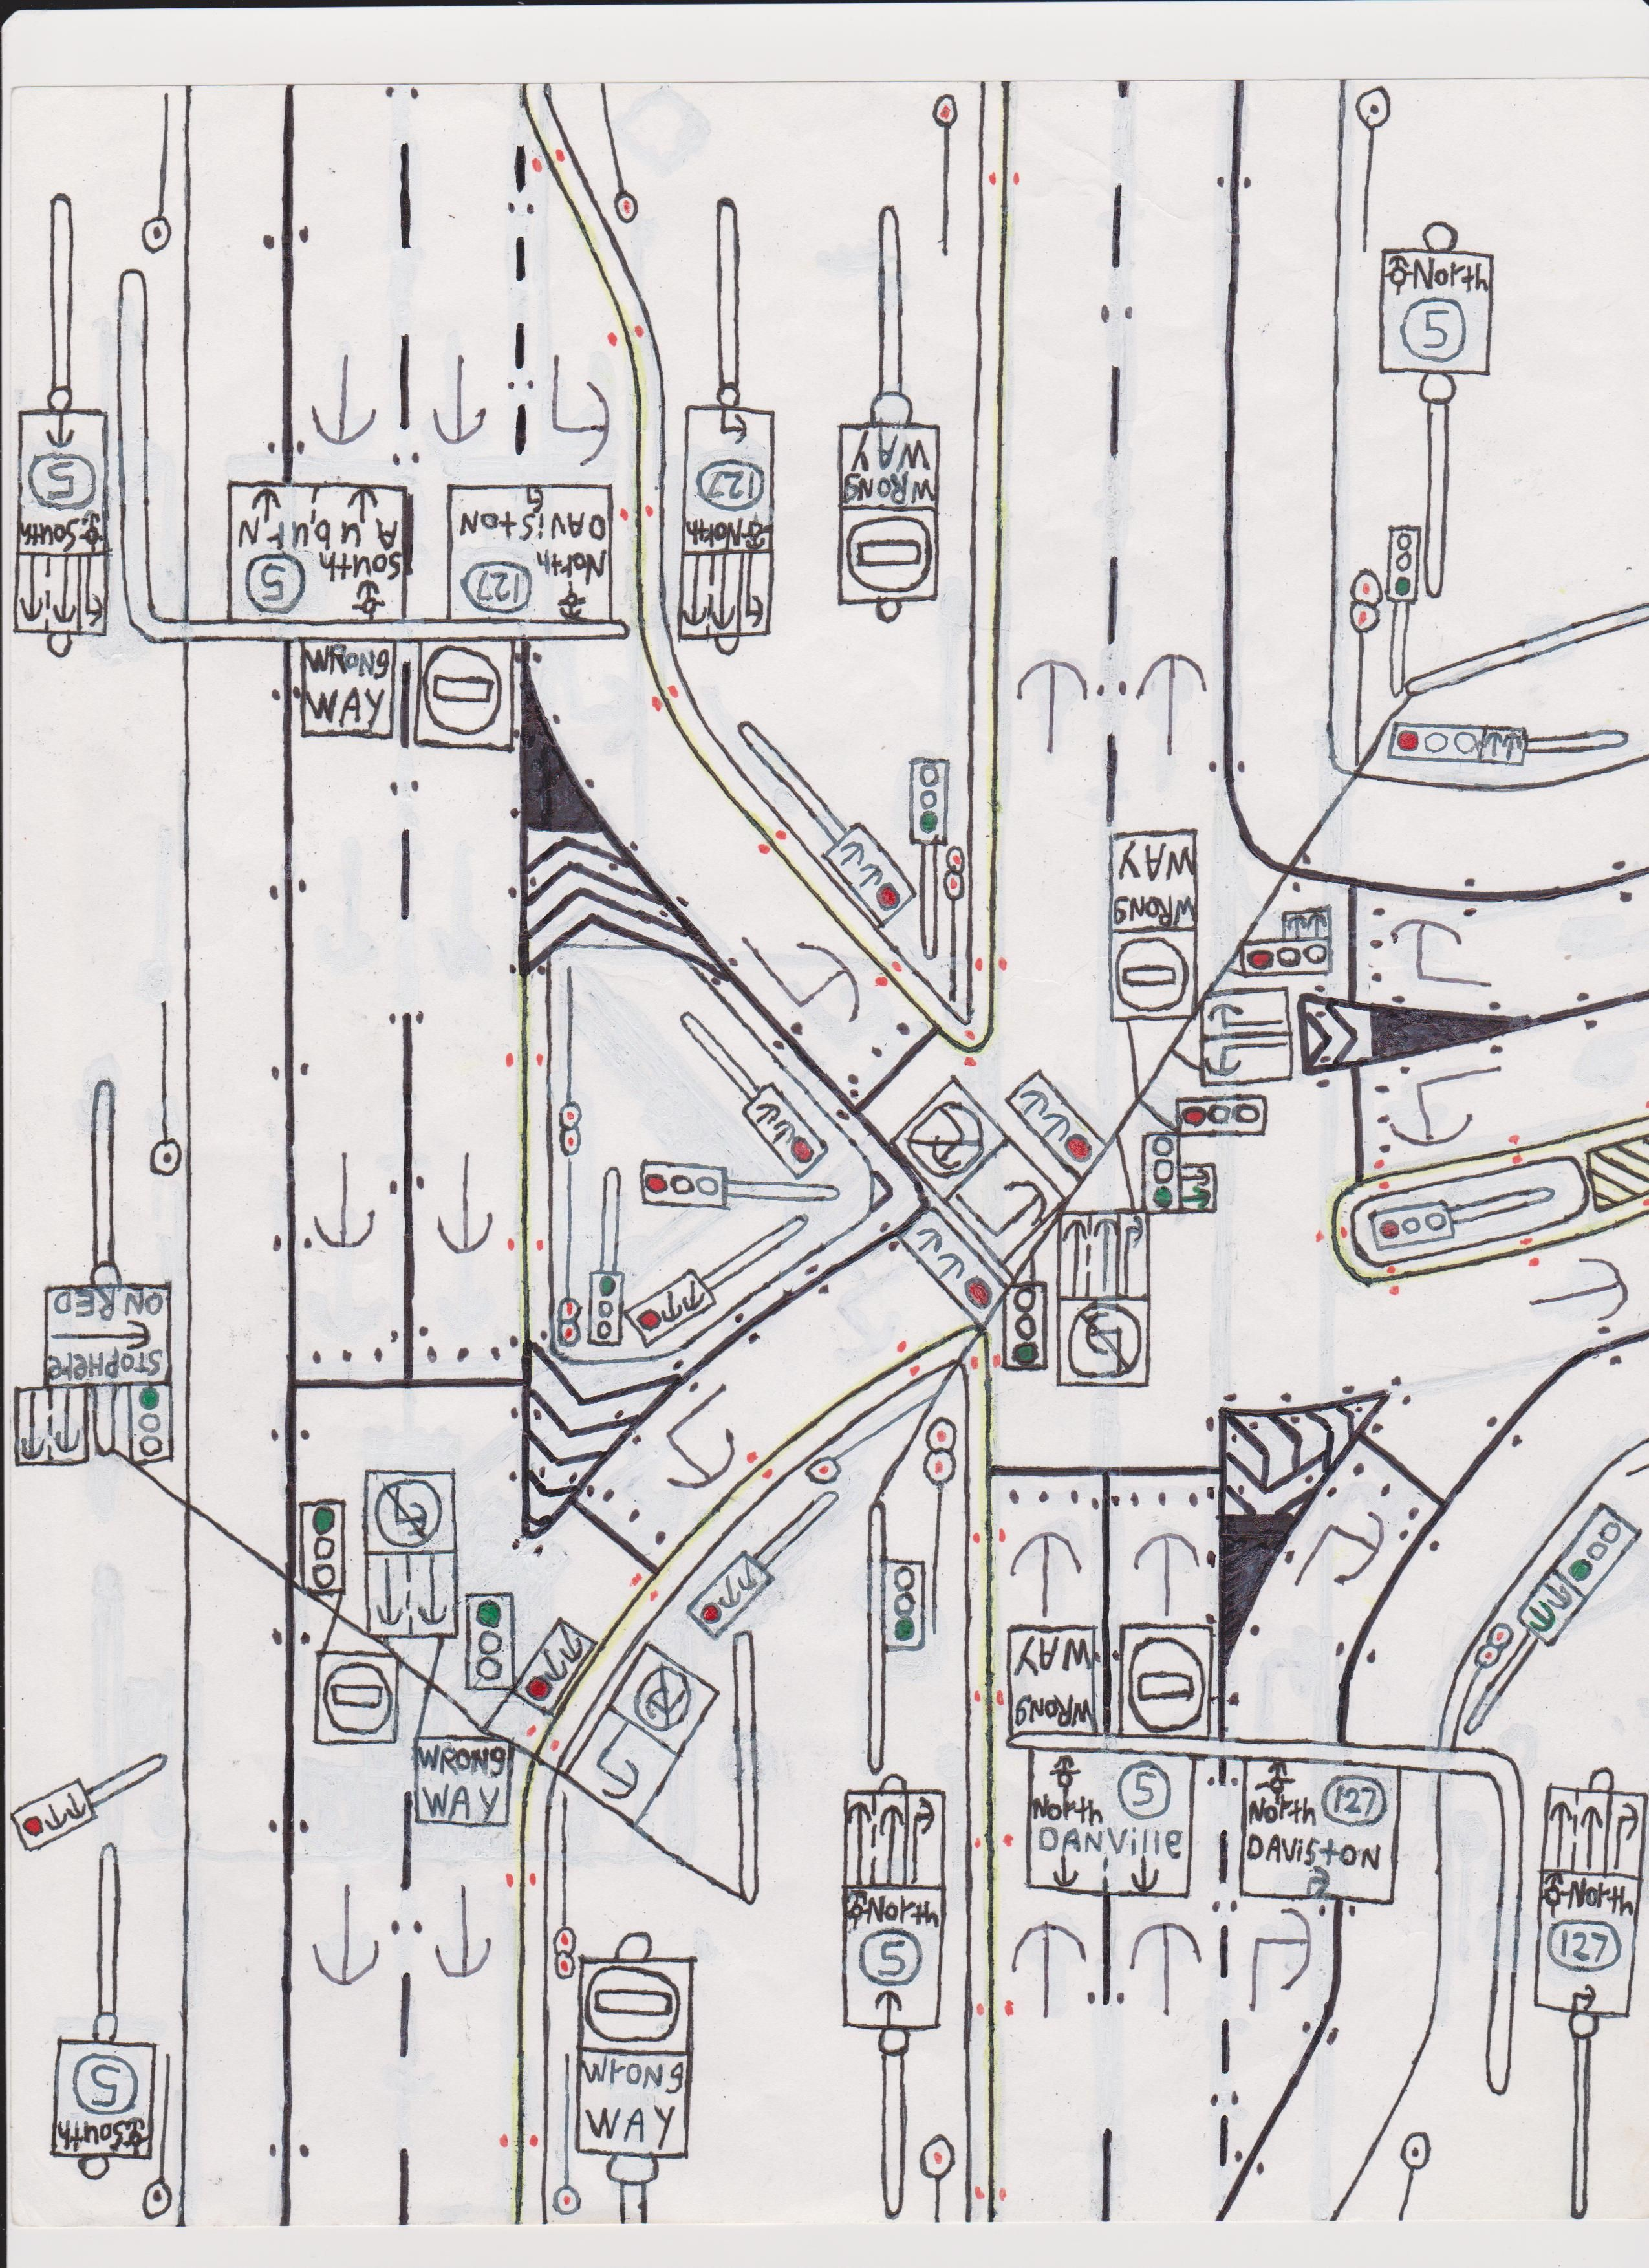 4-lane highway traffic light intersection. | Road Drawings Stuff ...